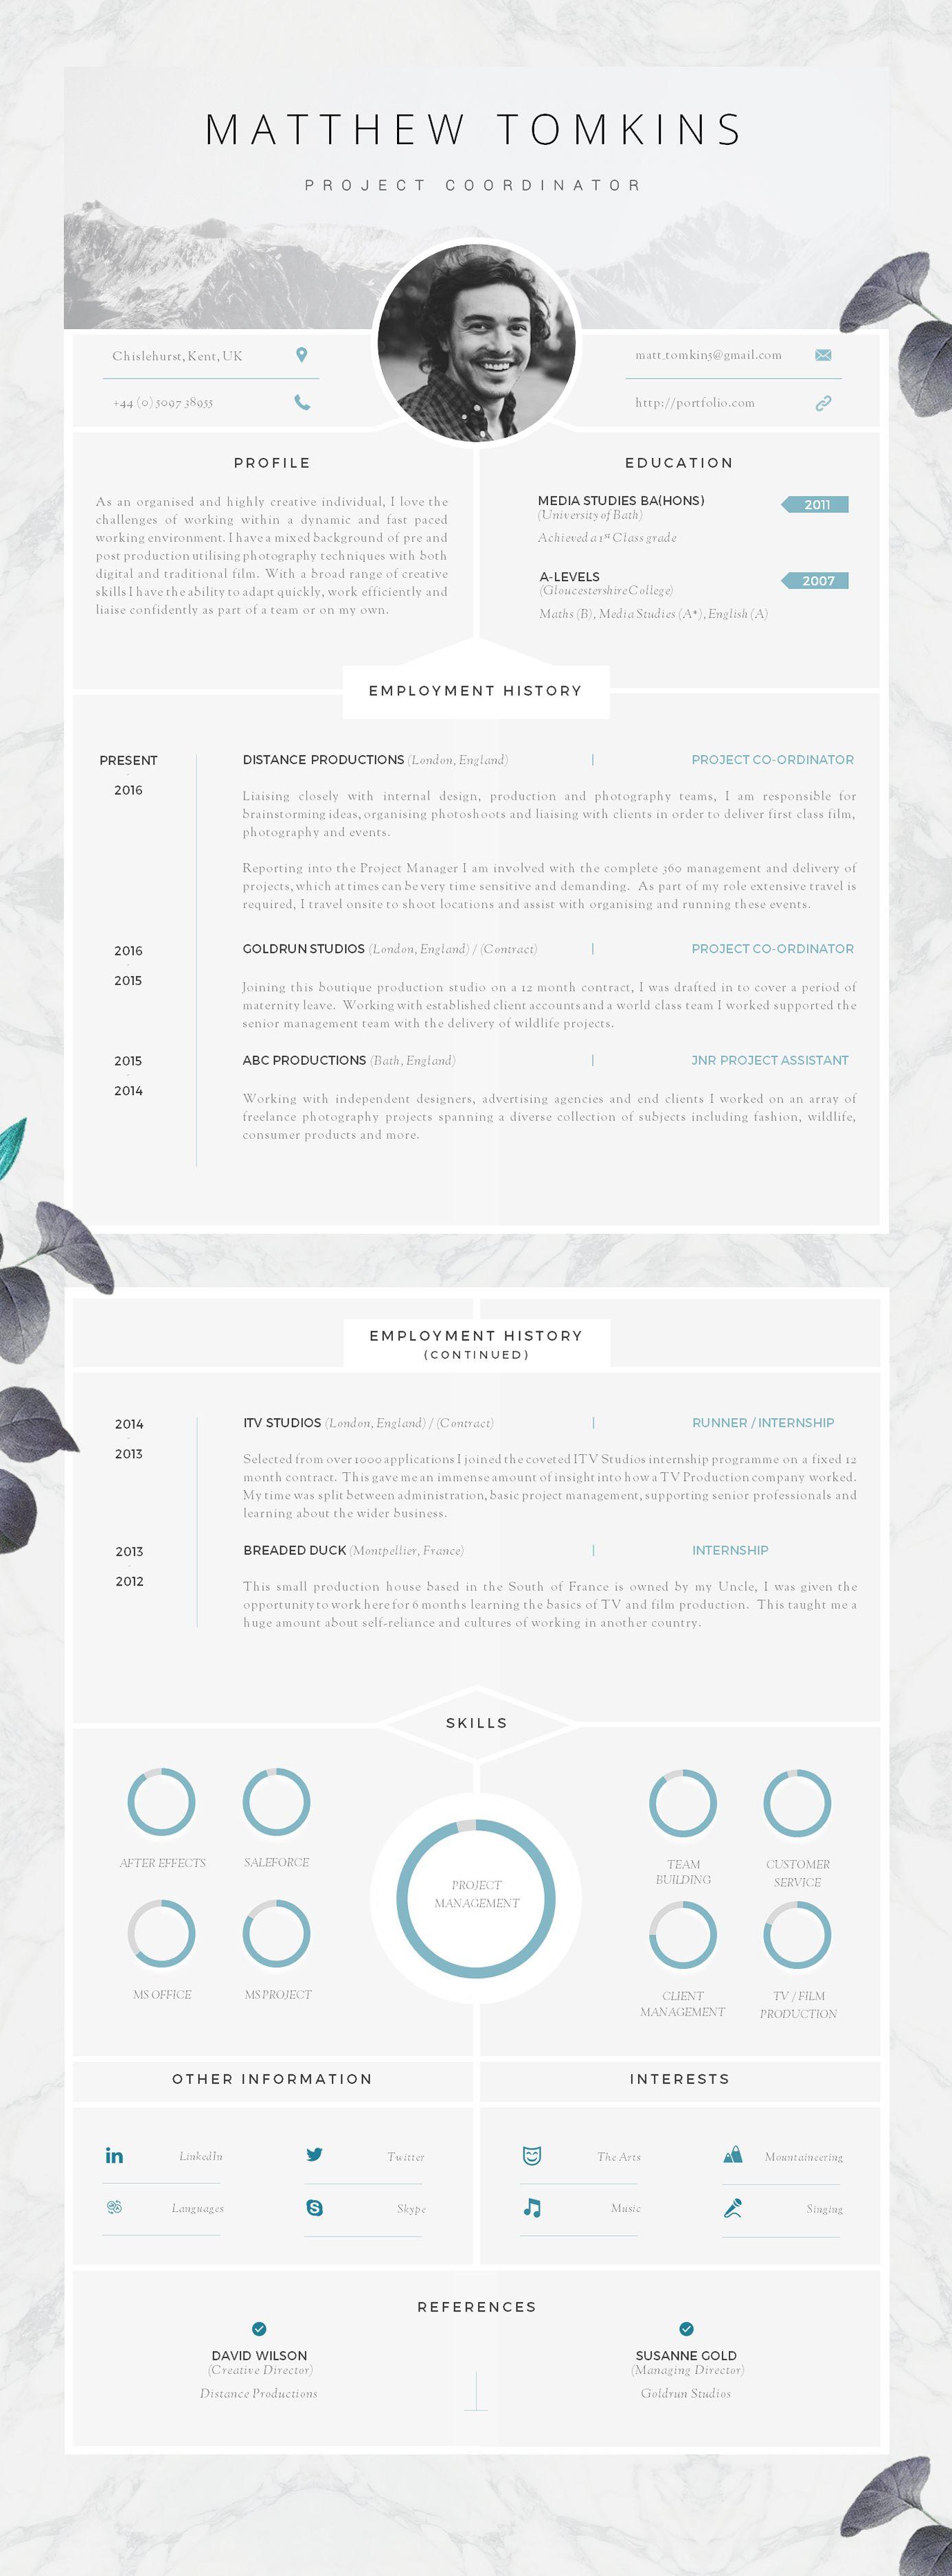 Image Result For Resume Format For Job Profile